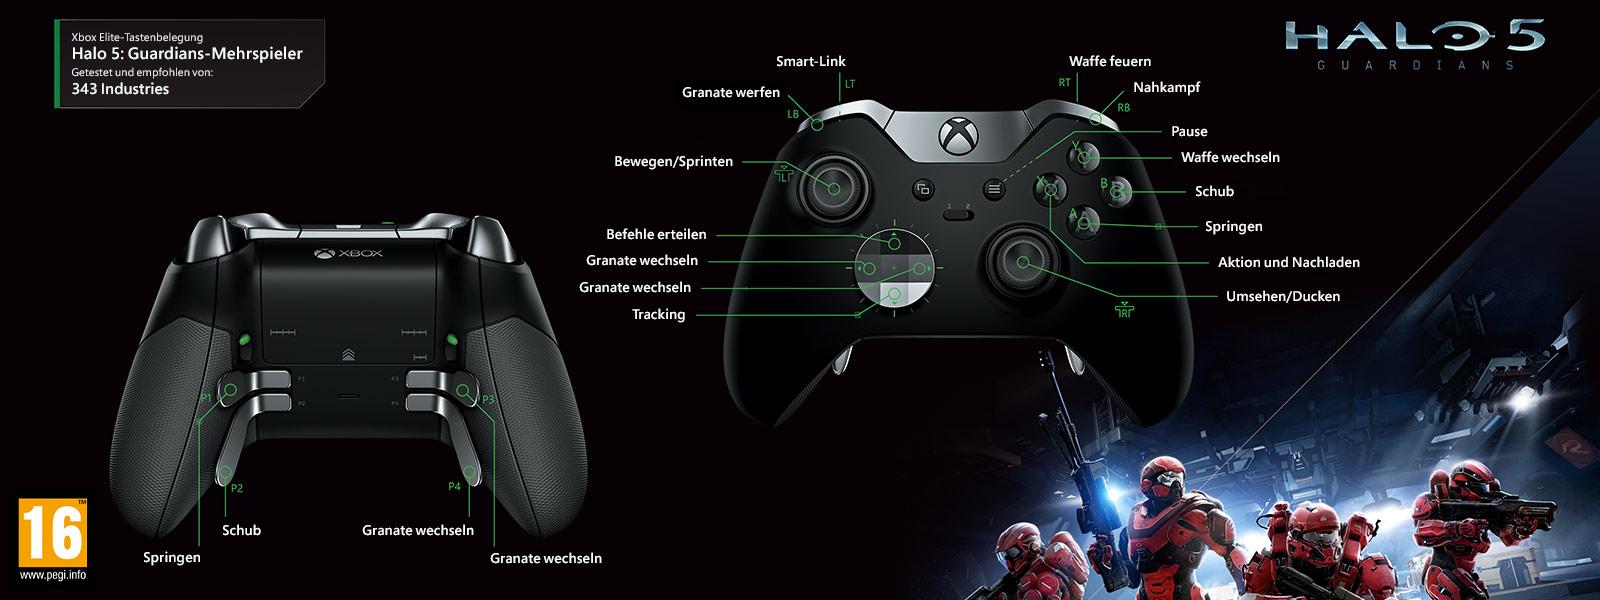 Halo 5: Guardians – Multiplayer-Elitezuordnung